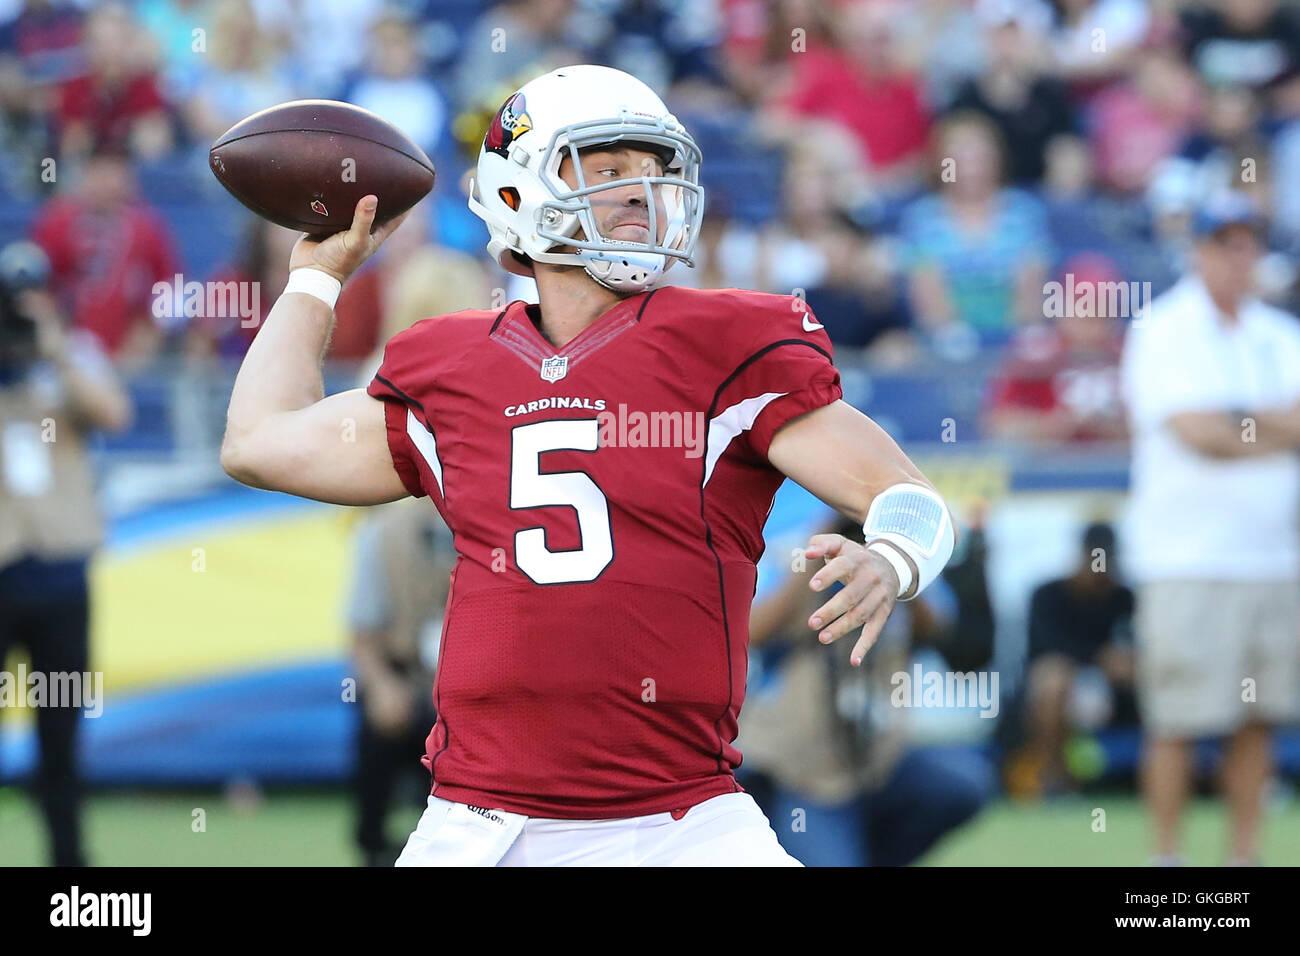 San Diego, CA, Stati Uniti d'America. 19 Ago, 2016. 9 agosto 2016: Arizona Cardinals quarterback Drew Stanton Immagini Stock